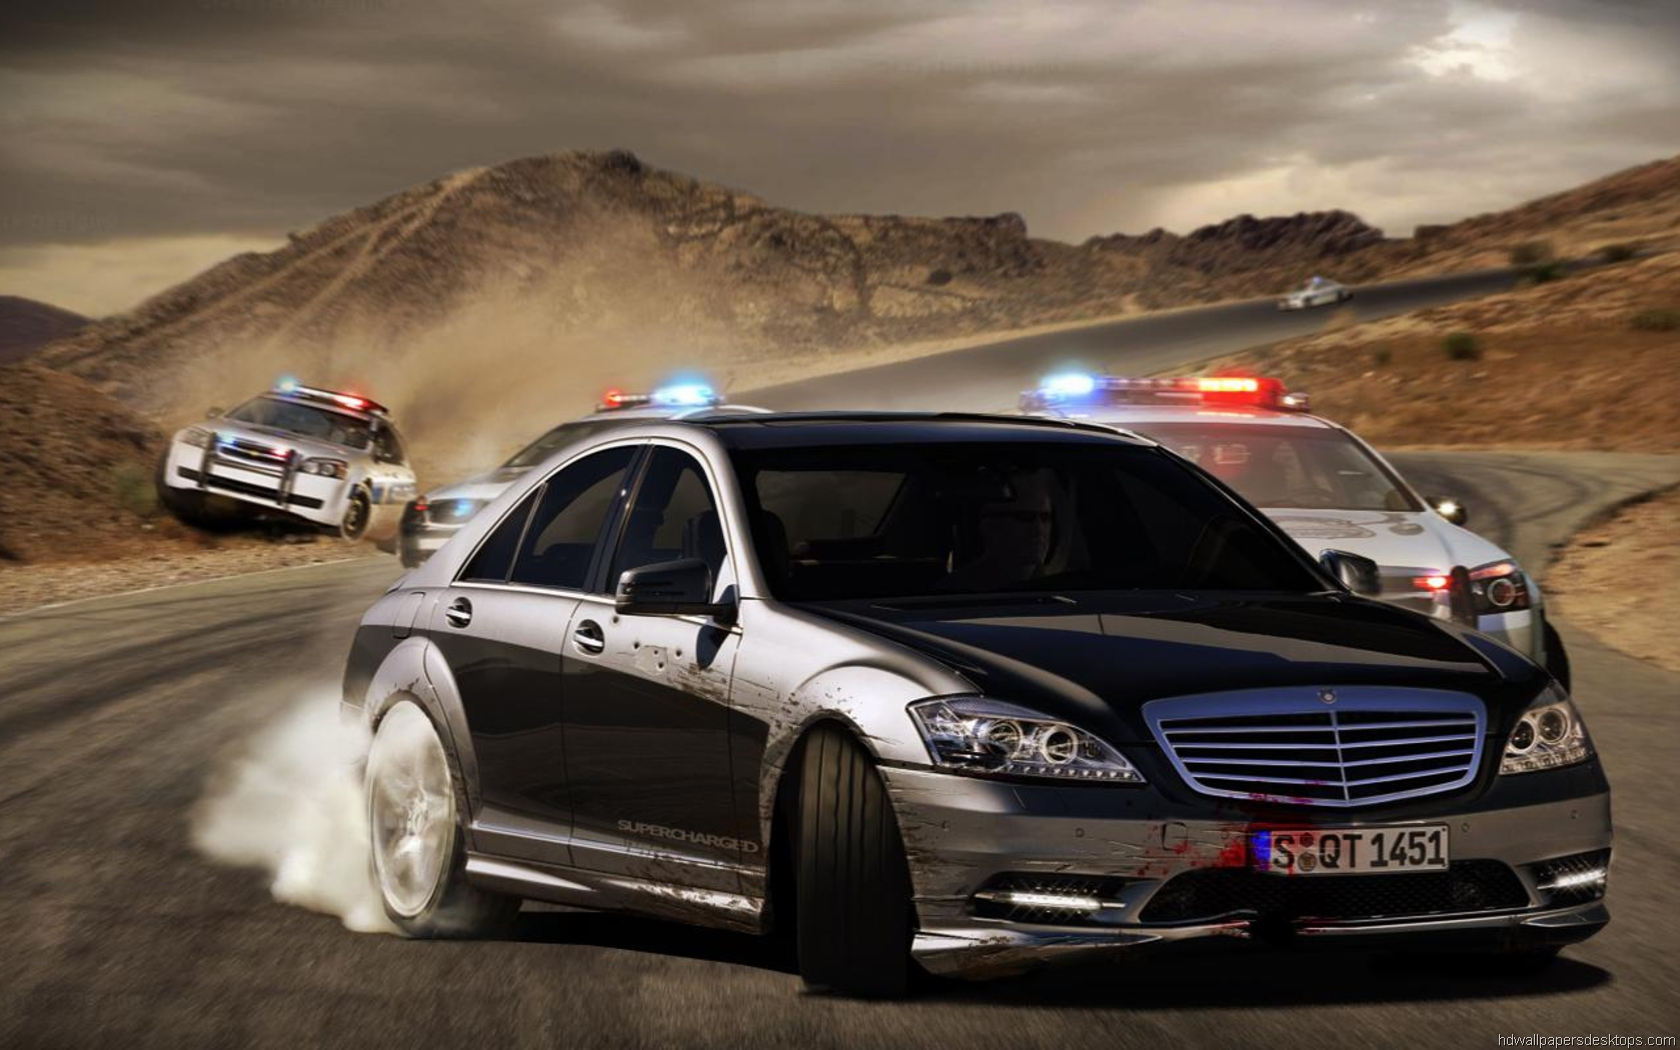 cars full hd wallpapers 1080p wallpaper backgrounds jaguar Car 1680x1050